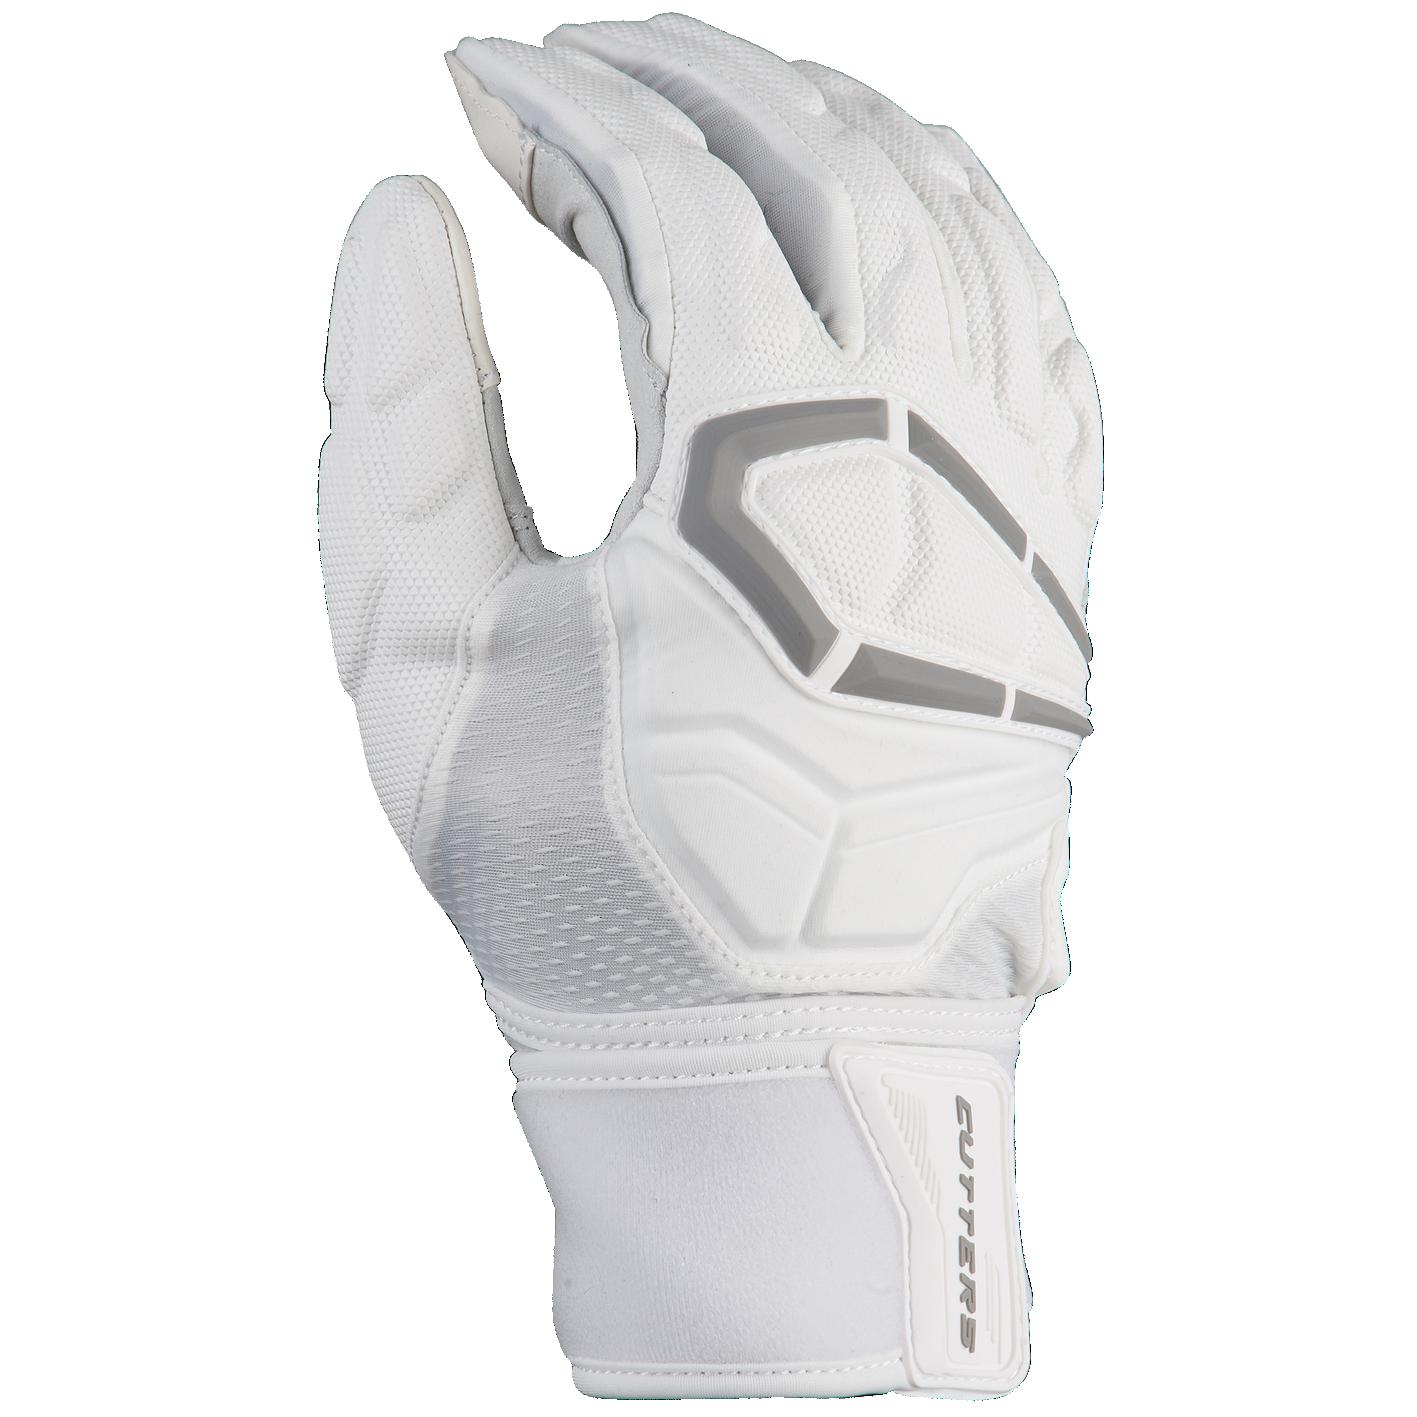 Cutters Force 3.0 Lineman Football Gloves - Men s - Football - Sport ... 8be135e2e